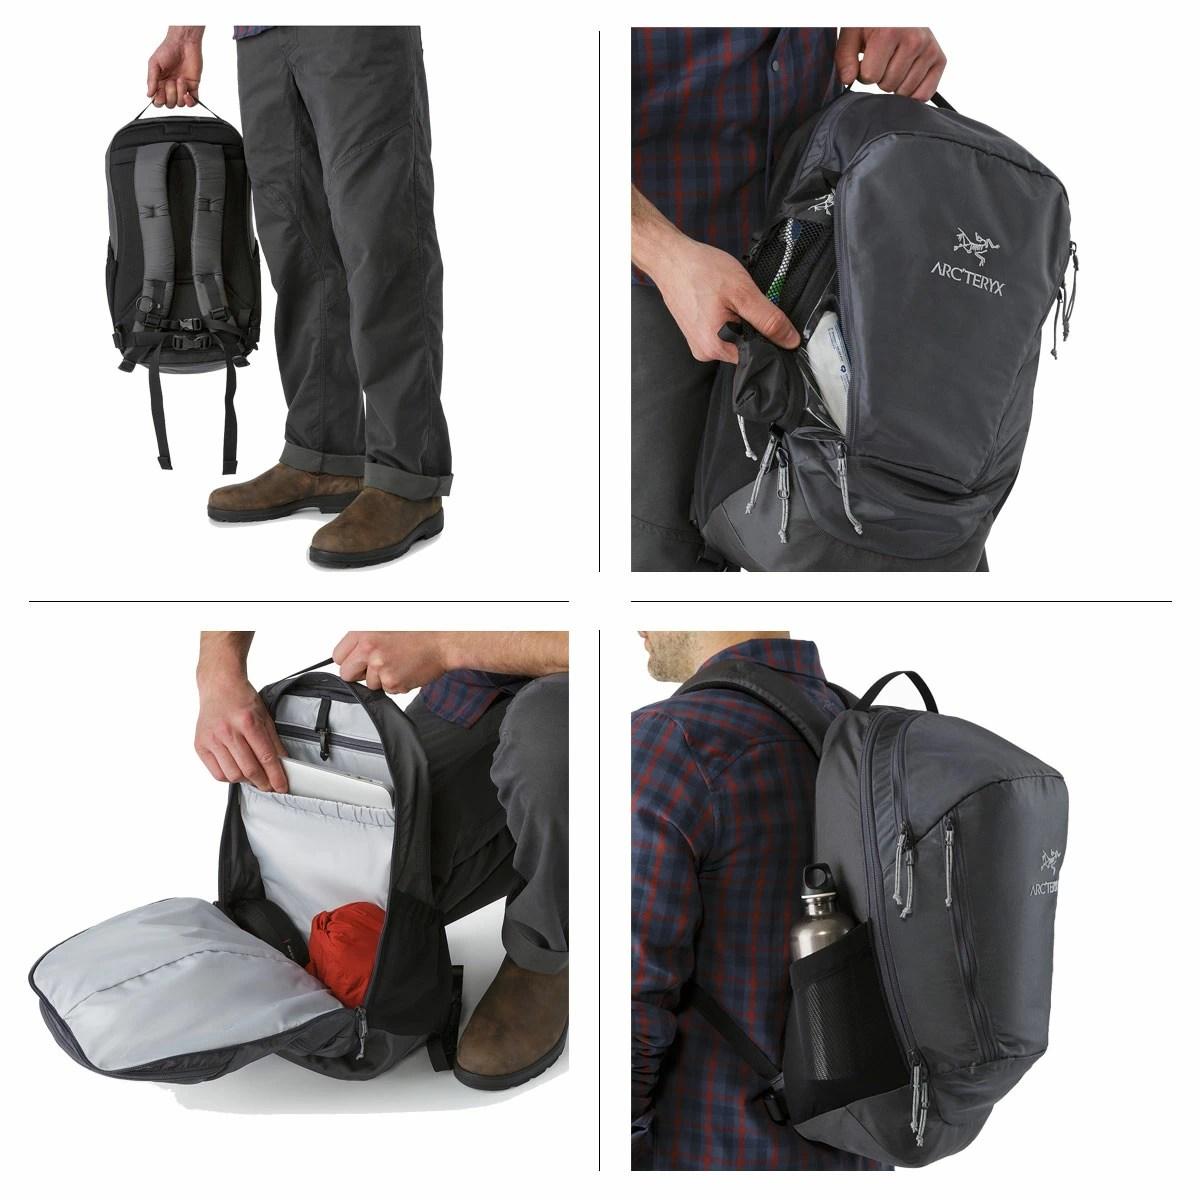 SneaK Online Shop: akuterikusu ARC'TERYX帆布背包背包包MANTIS 26 BACKPACK 7715 26L人黑色灰色深藍 | 日本樂天市場